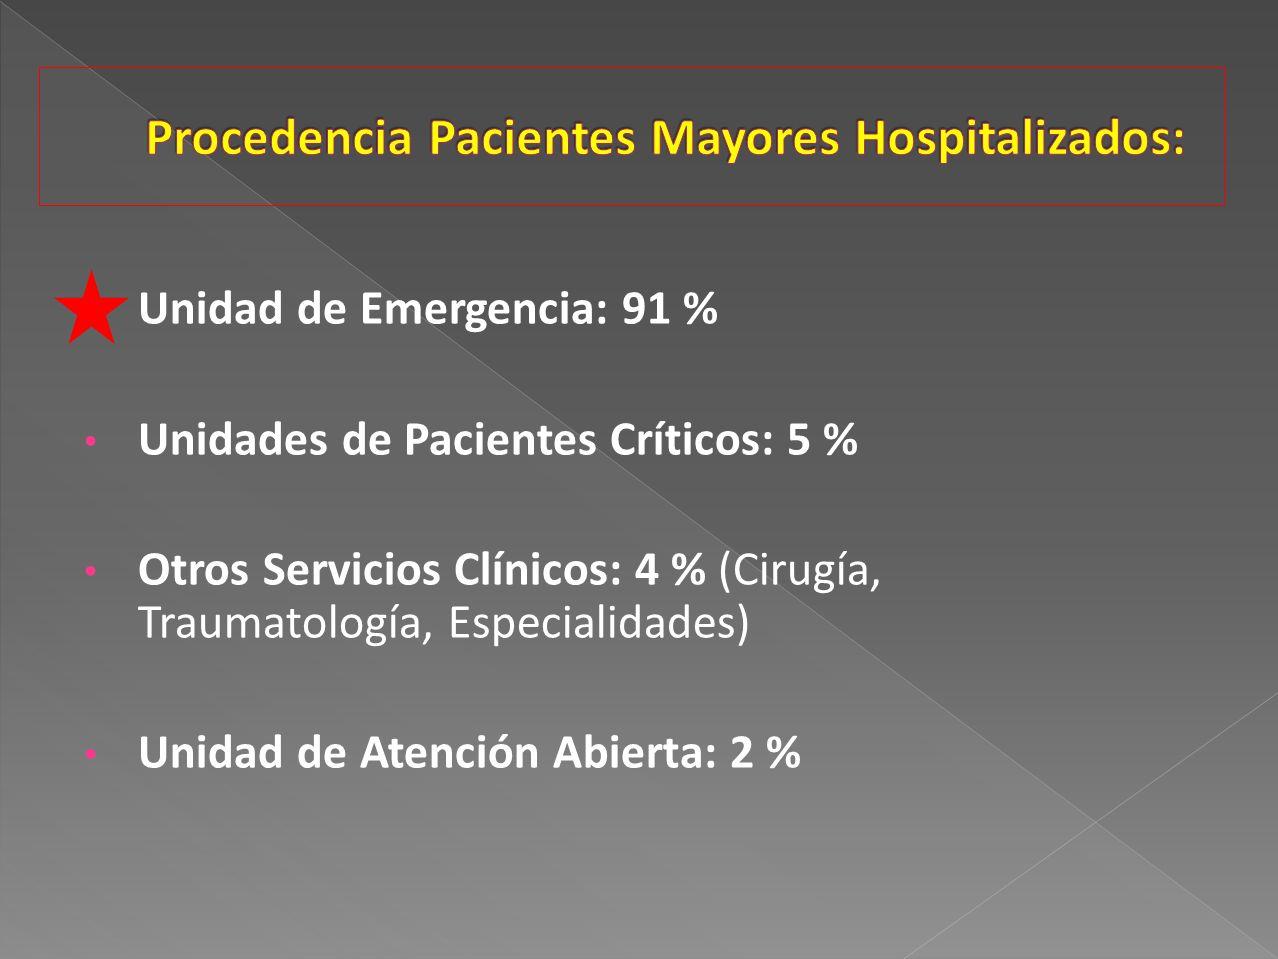 Procedencia Pacientes Mayores Hospitalizados: